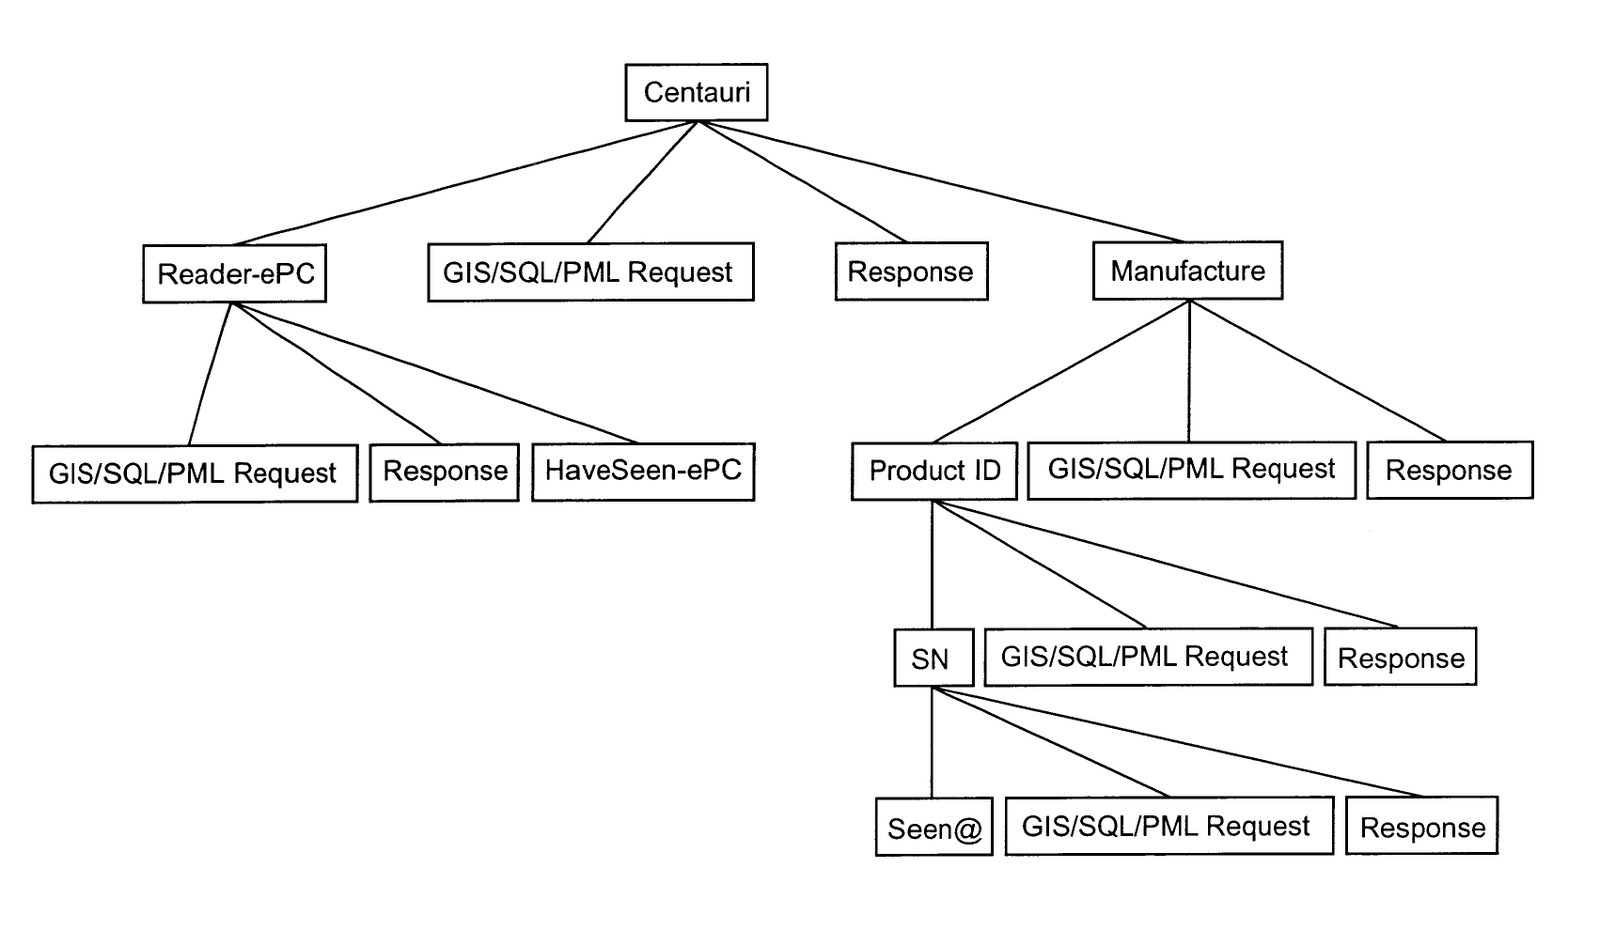 Example Er Diagram Of Inventory Management System Download intended for Er Diagram Examples For Inventory Management System